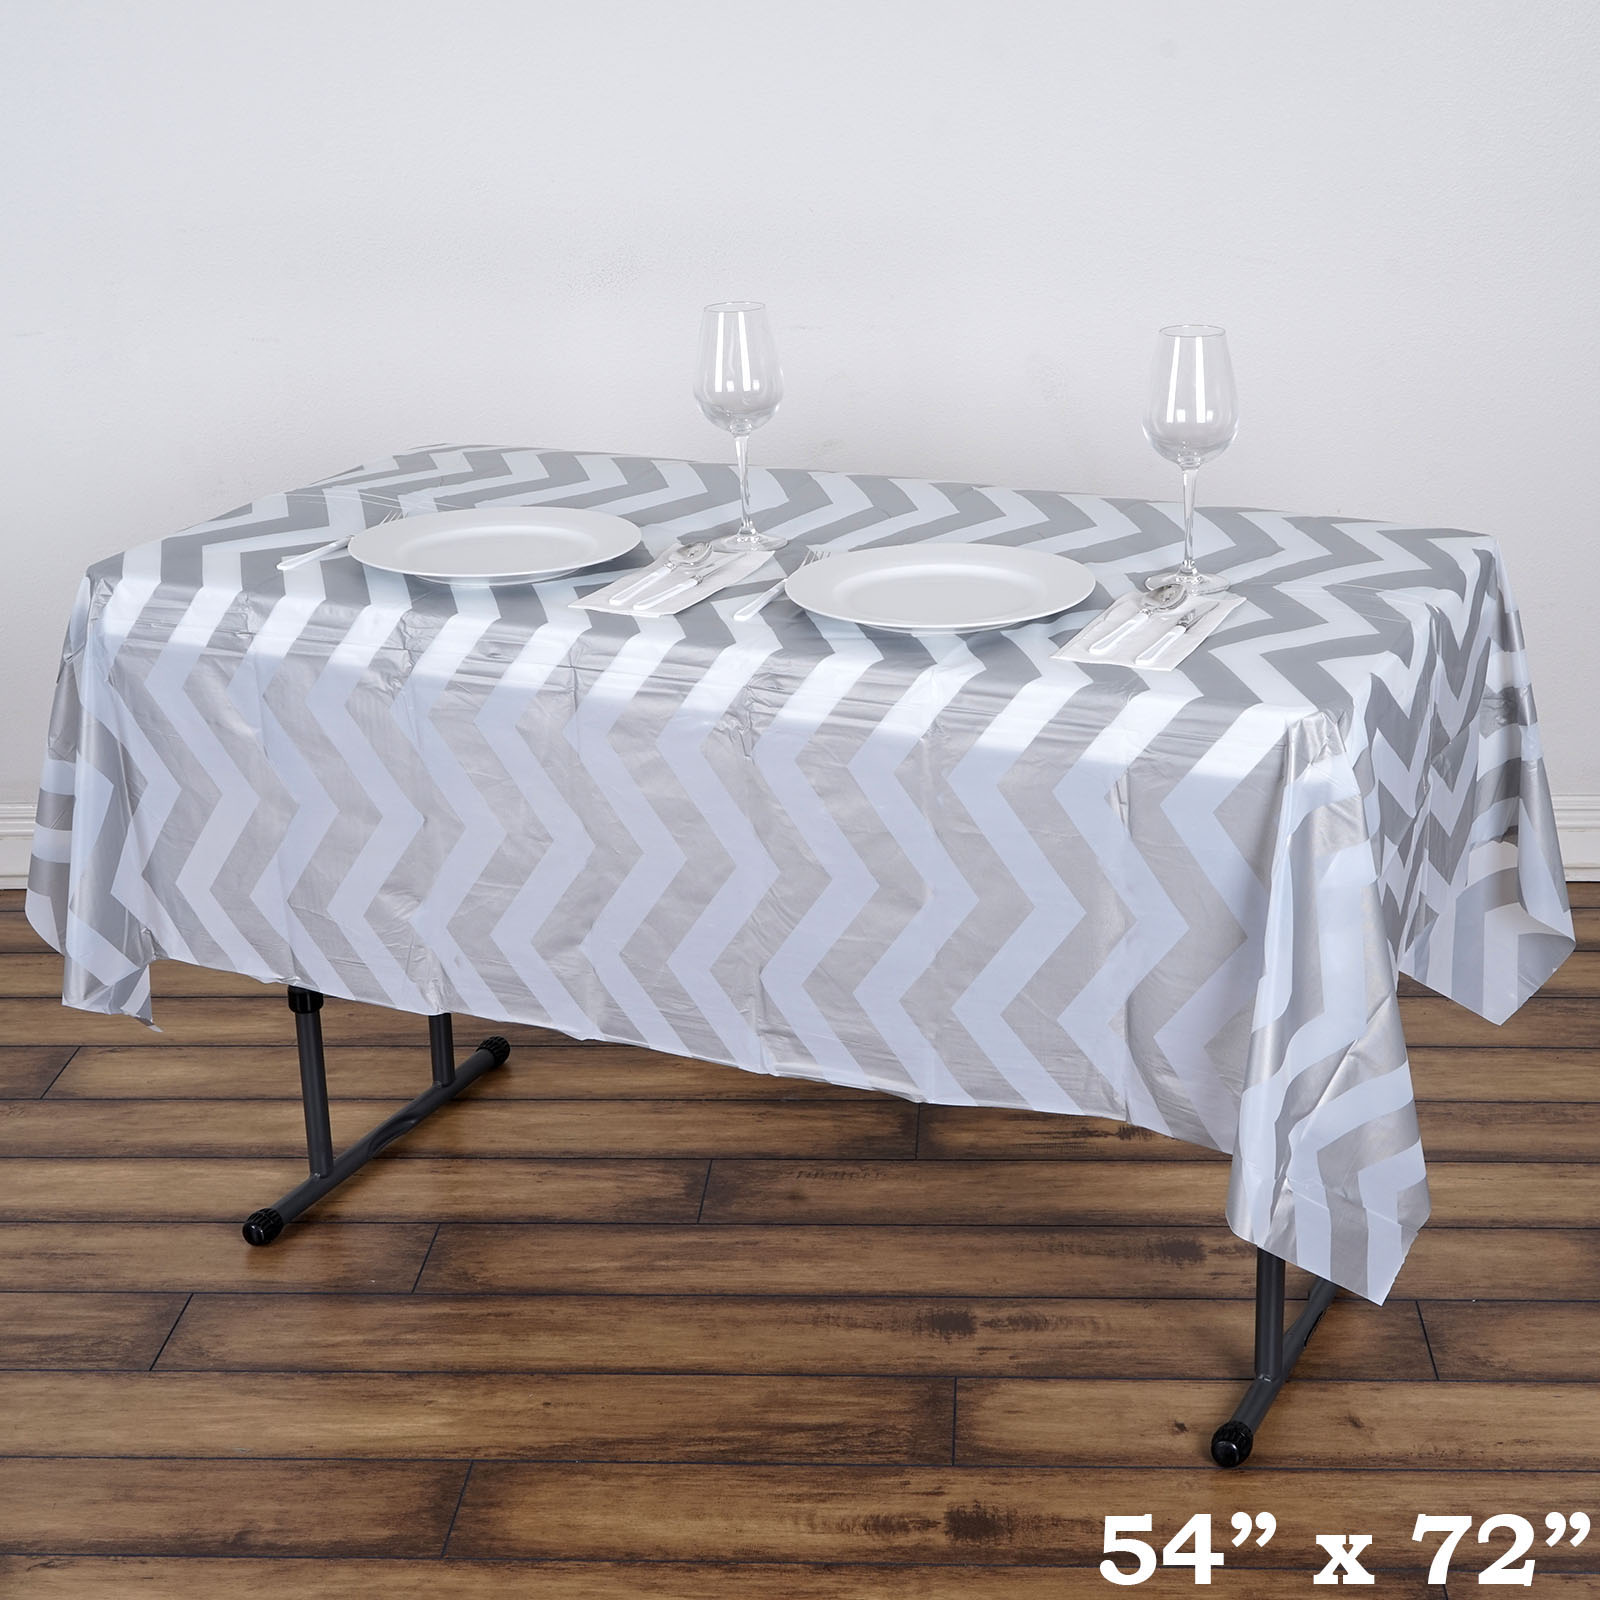 "BalsaCircle 54"" x 72"" Rectangular Chevron Disposable Plastic Tablecloths - Party Picnic Table Covers Decorations"